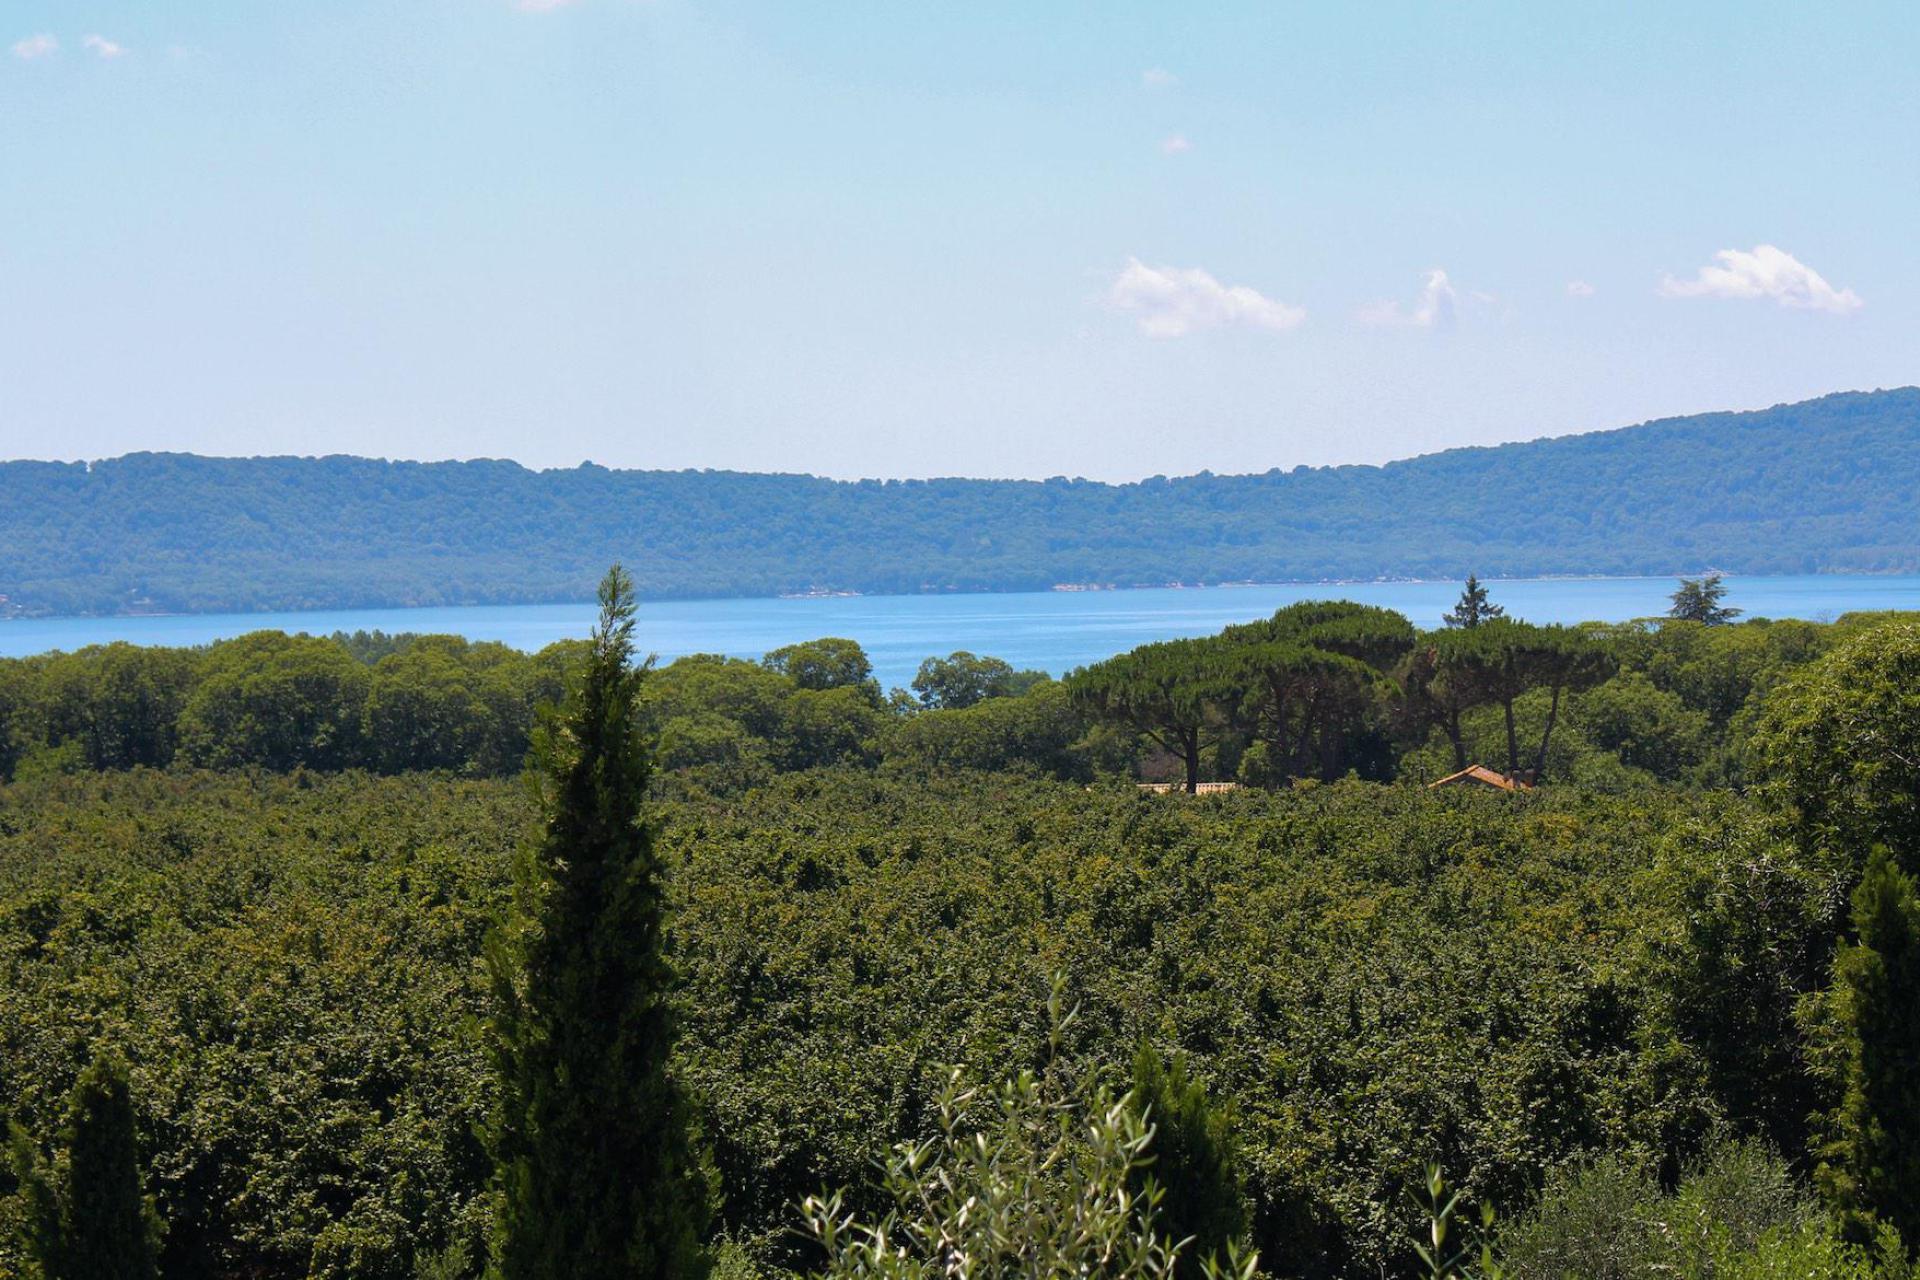 Agriturismo Toskana Agriturismo Toskana, authentisches Weingut im Chianti